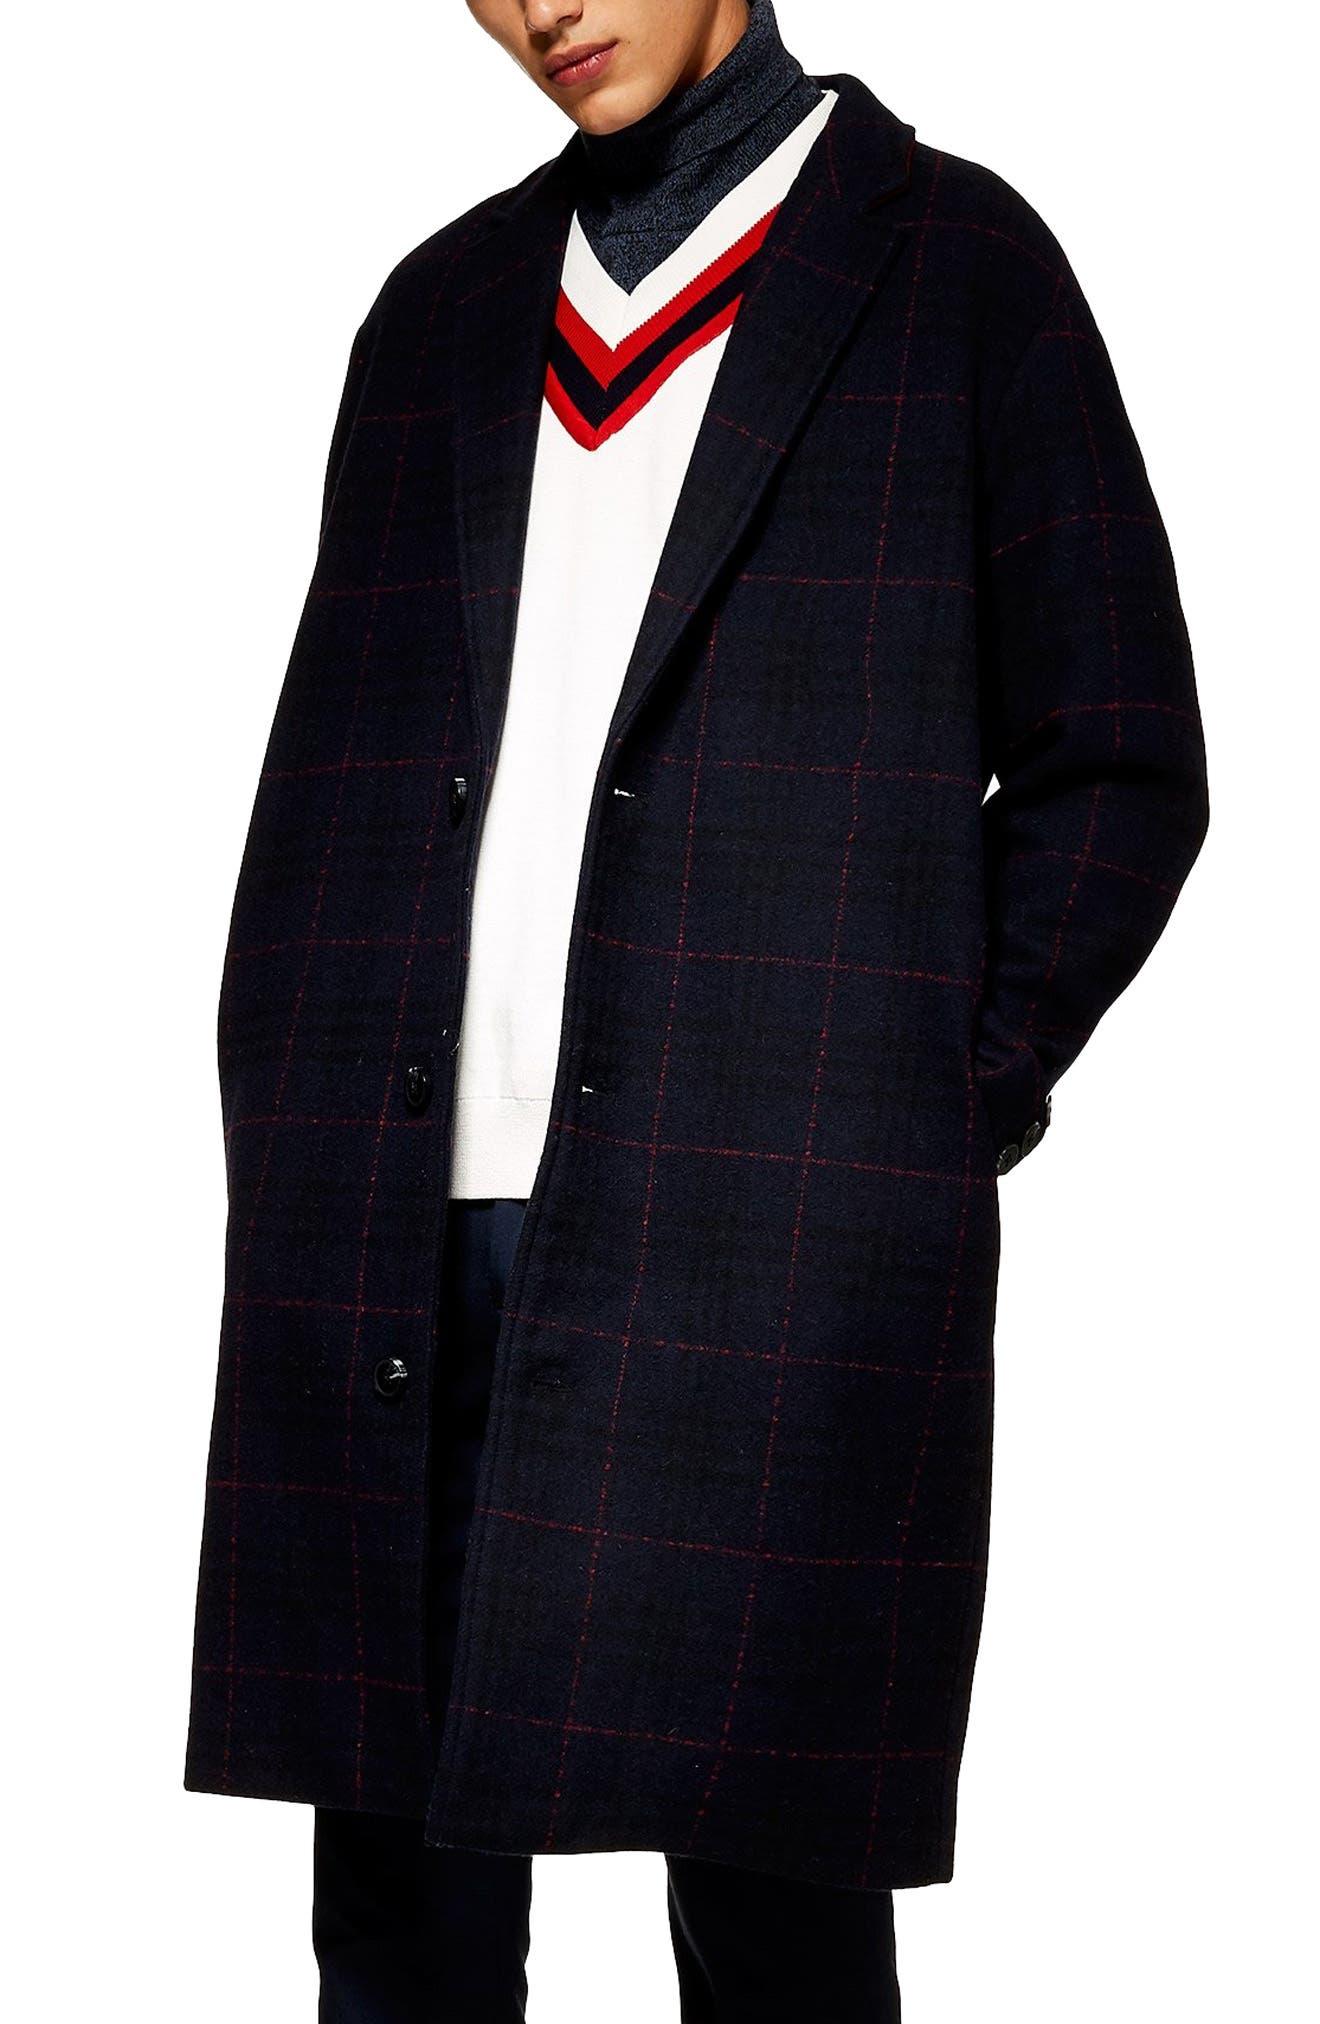 TOPMAN Hadyn Oversize Check Print Overcoat, Main, color, 401